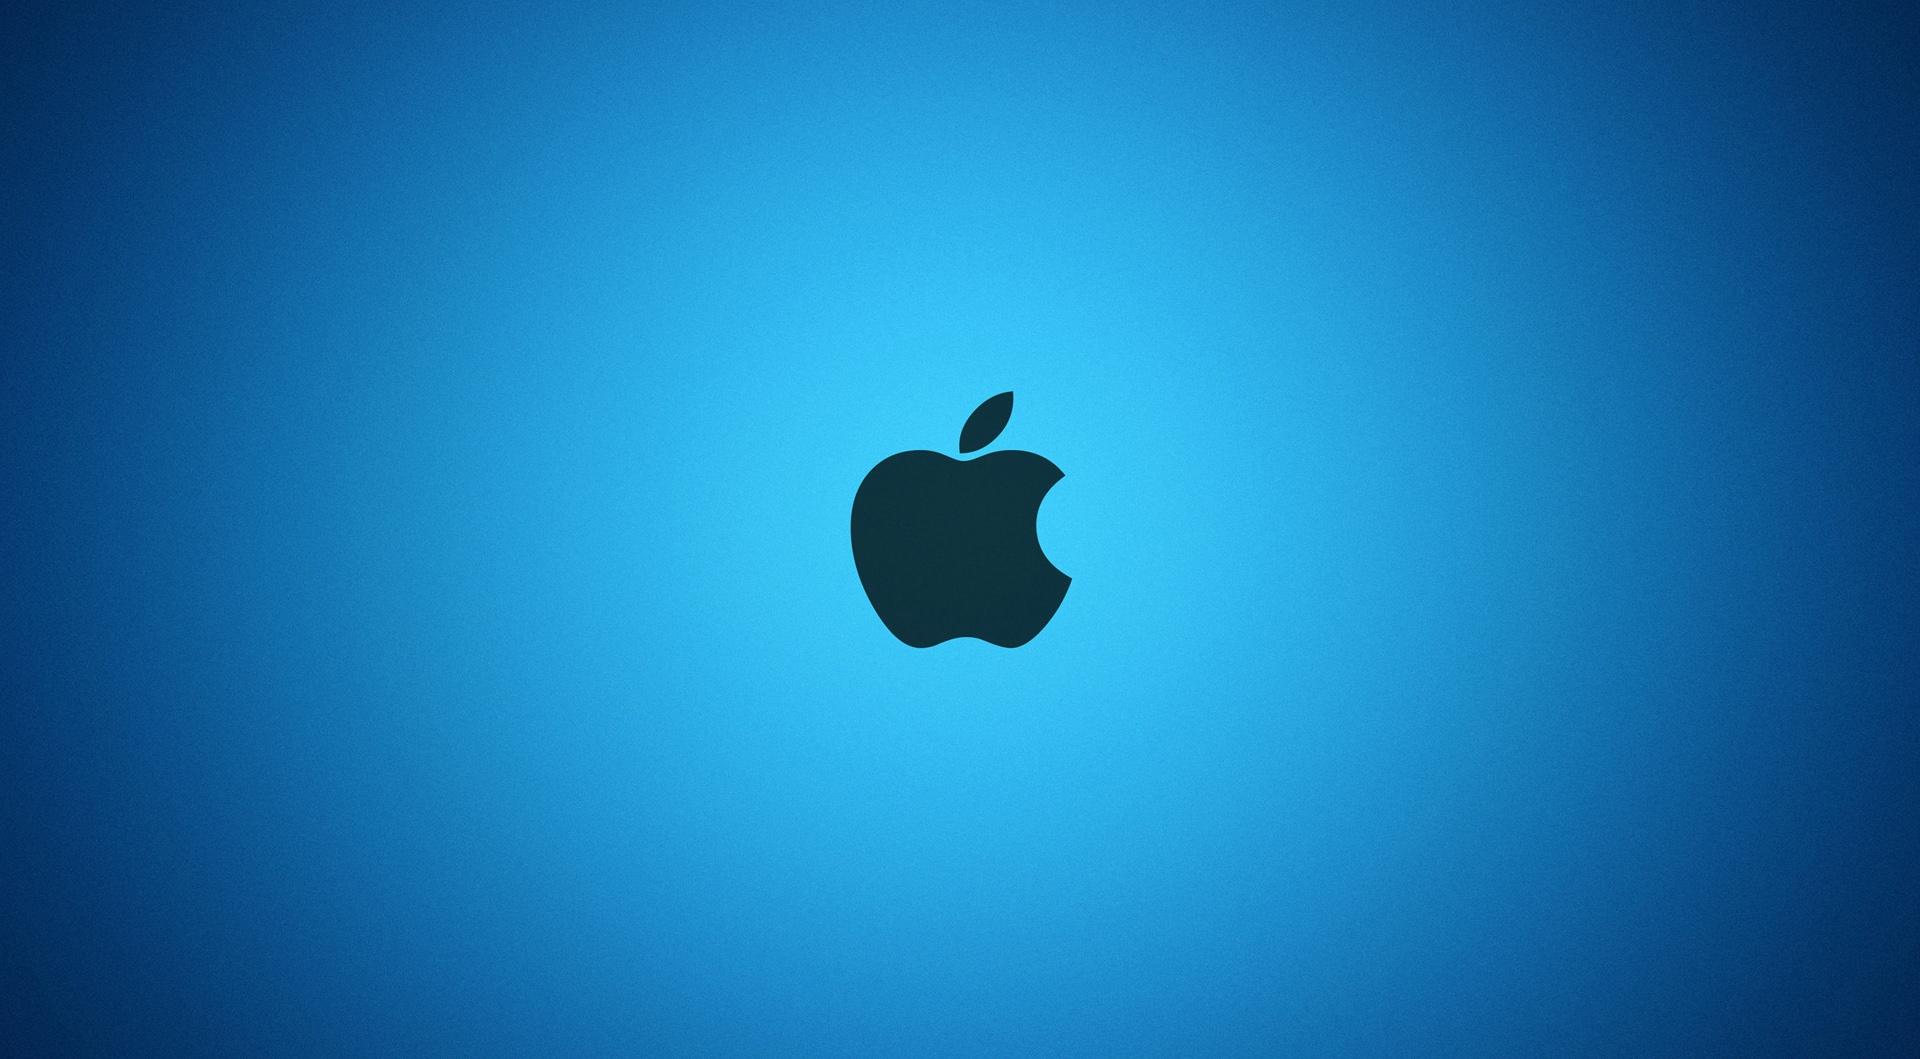 <p>Apple LOGO</p>